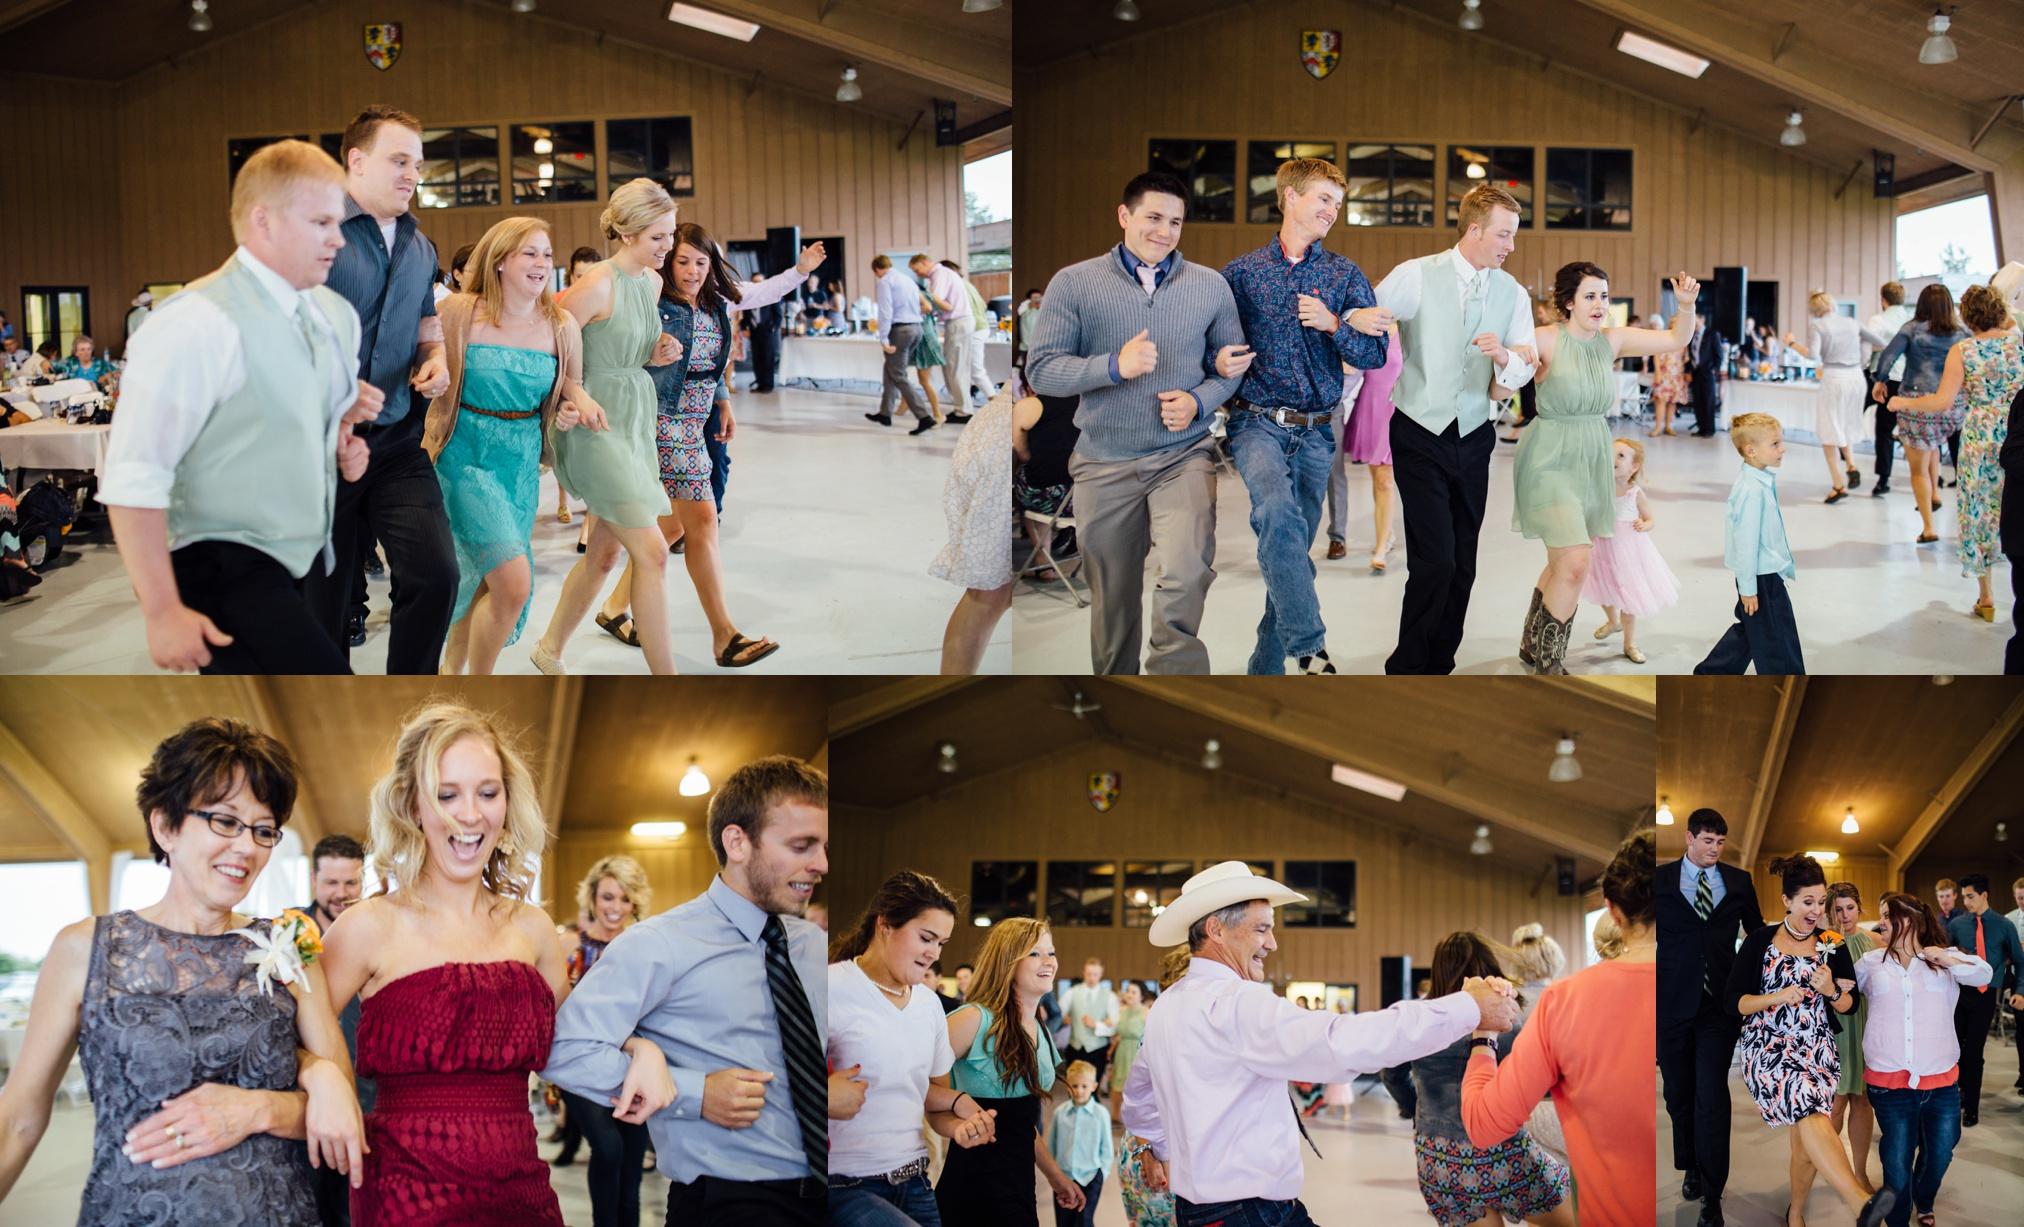 schmid_wedding-911.jpg